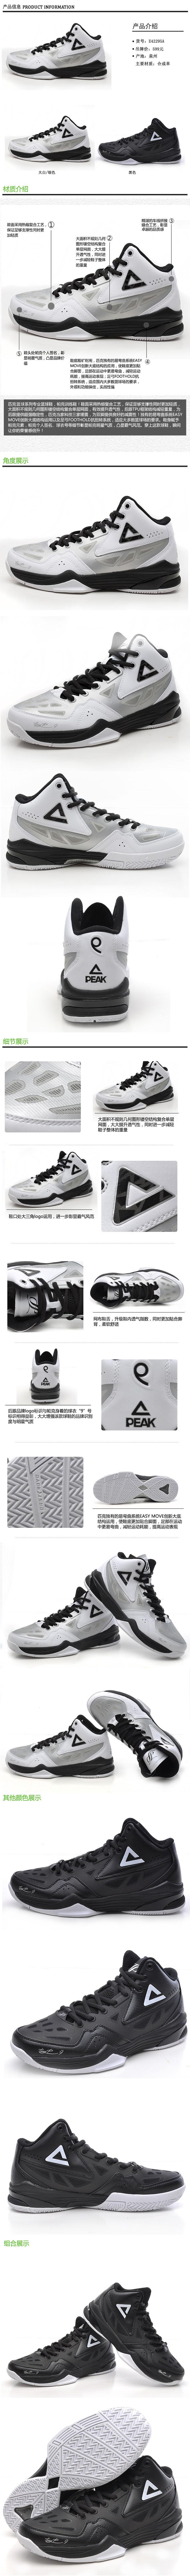 Peak Tony Parker Professional Basketball Training Shoes